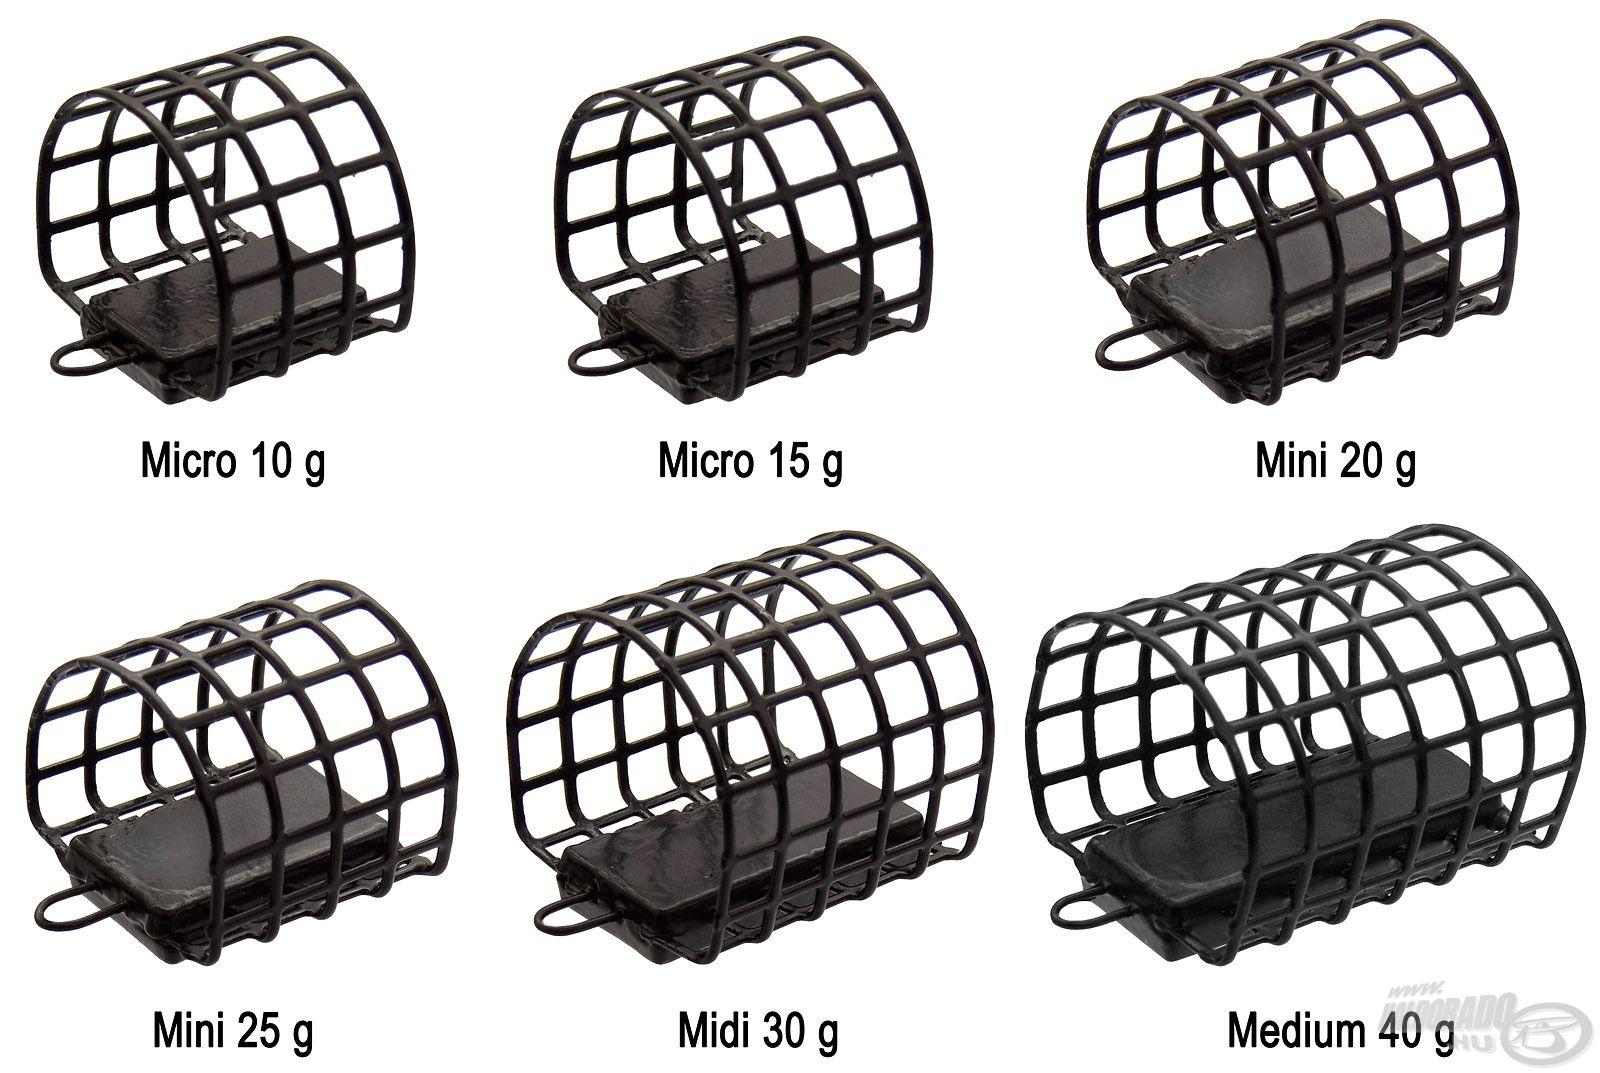 4x12 Mini Feeder 25 g